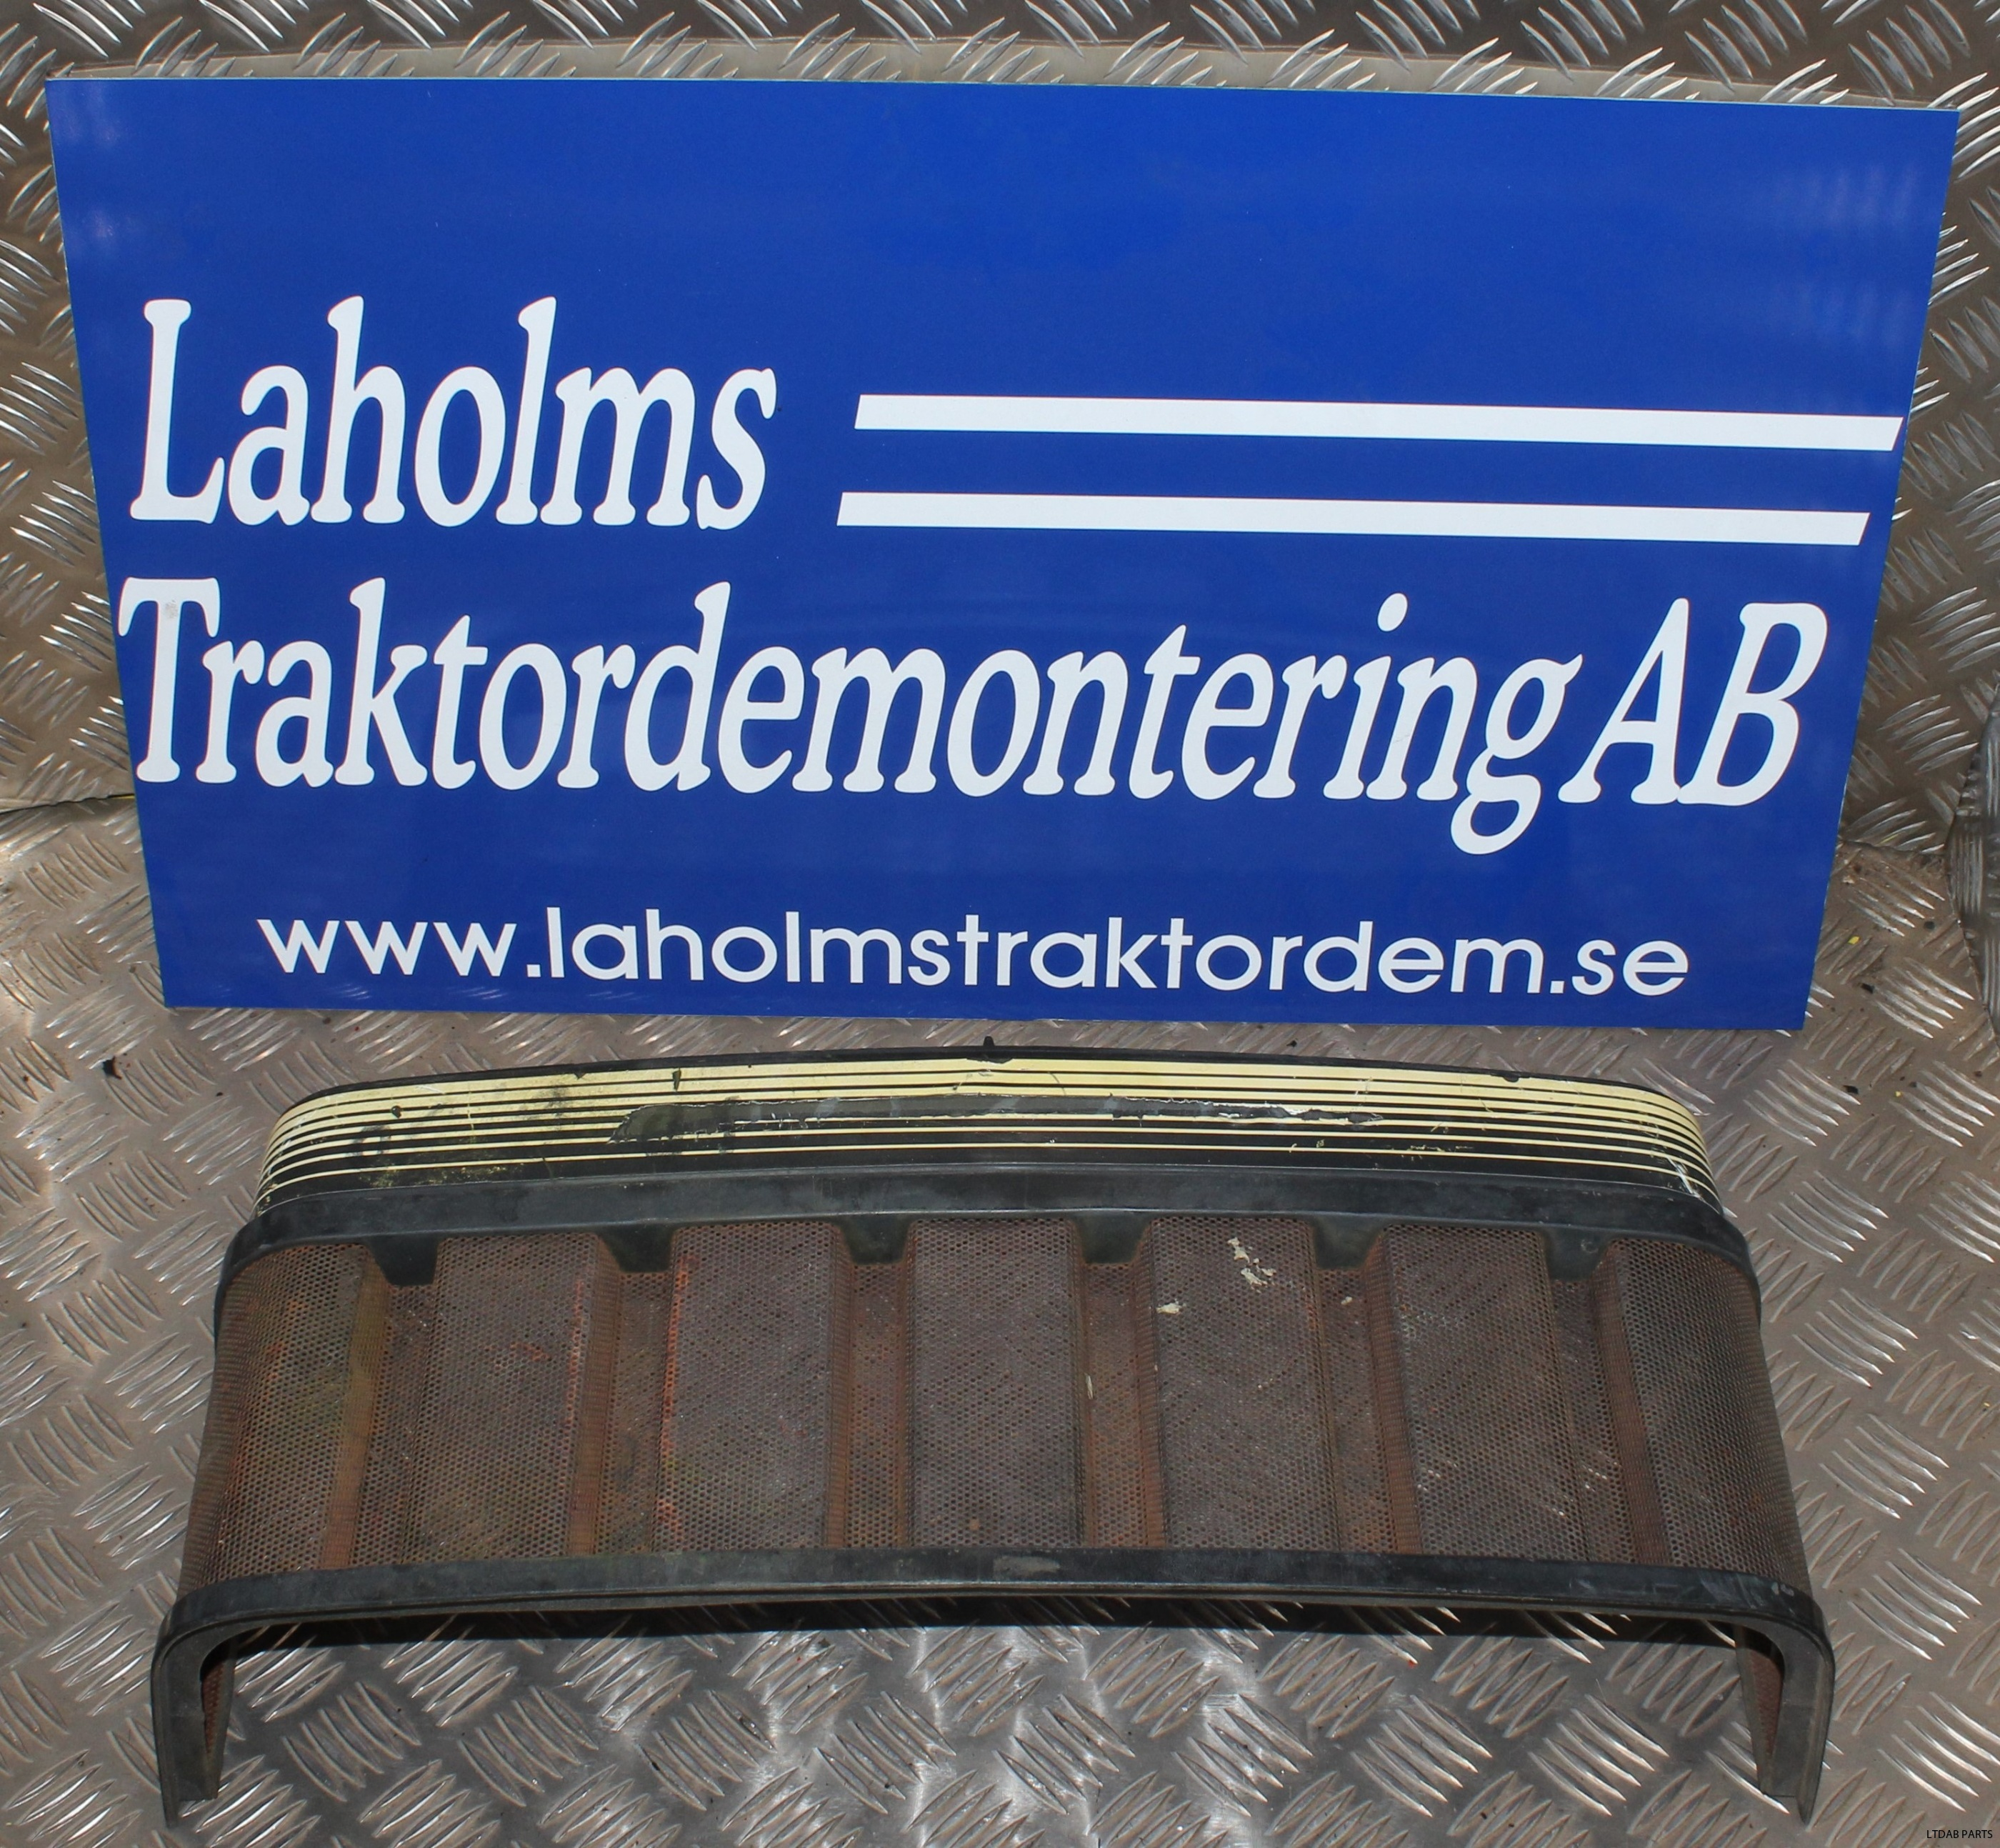 BEG Grill Valmet 2005 | Laholms Traktordemontering AB